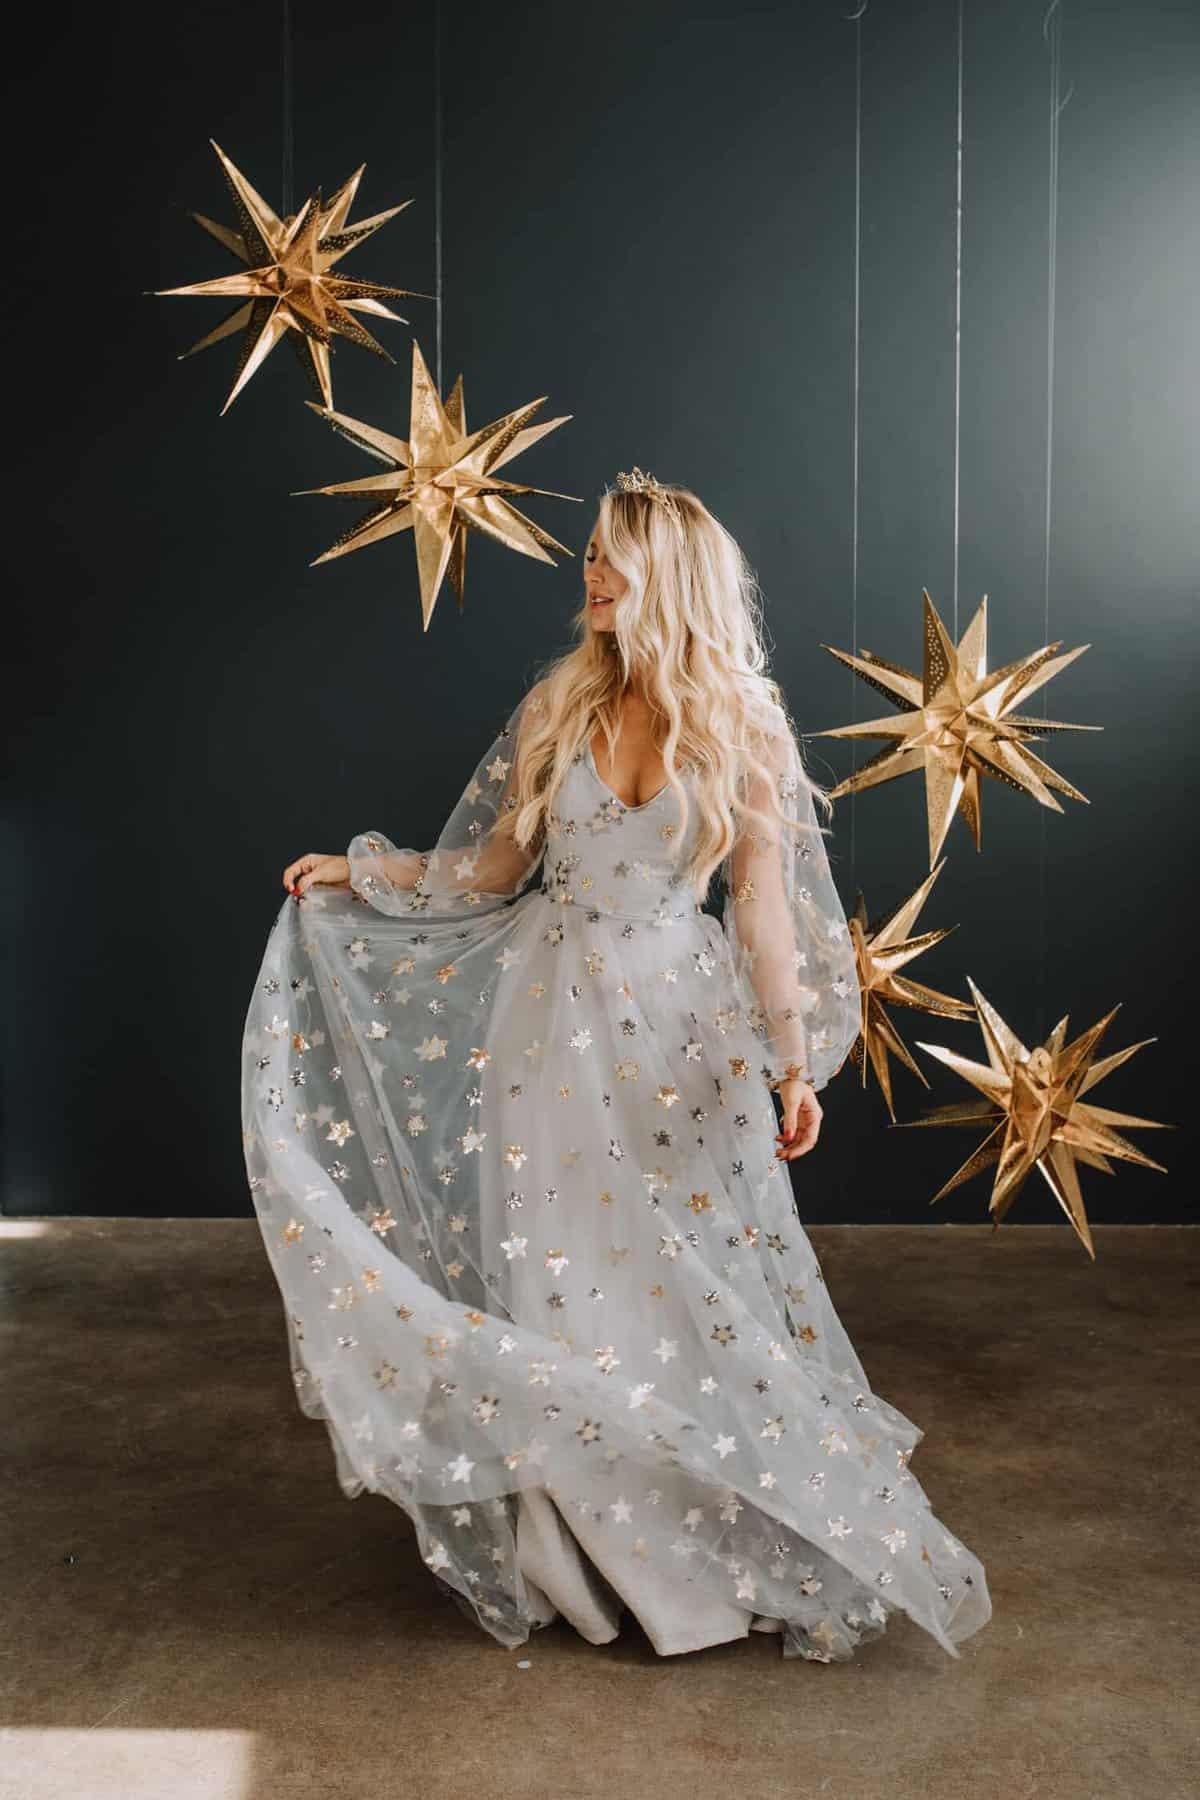 natalie-wynn-design-starstruck-unique-star-galaxy-themed-wedding-gown